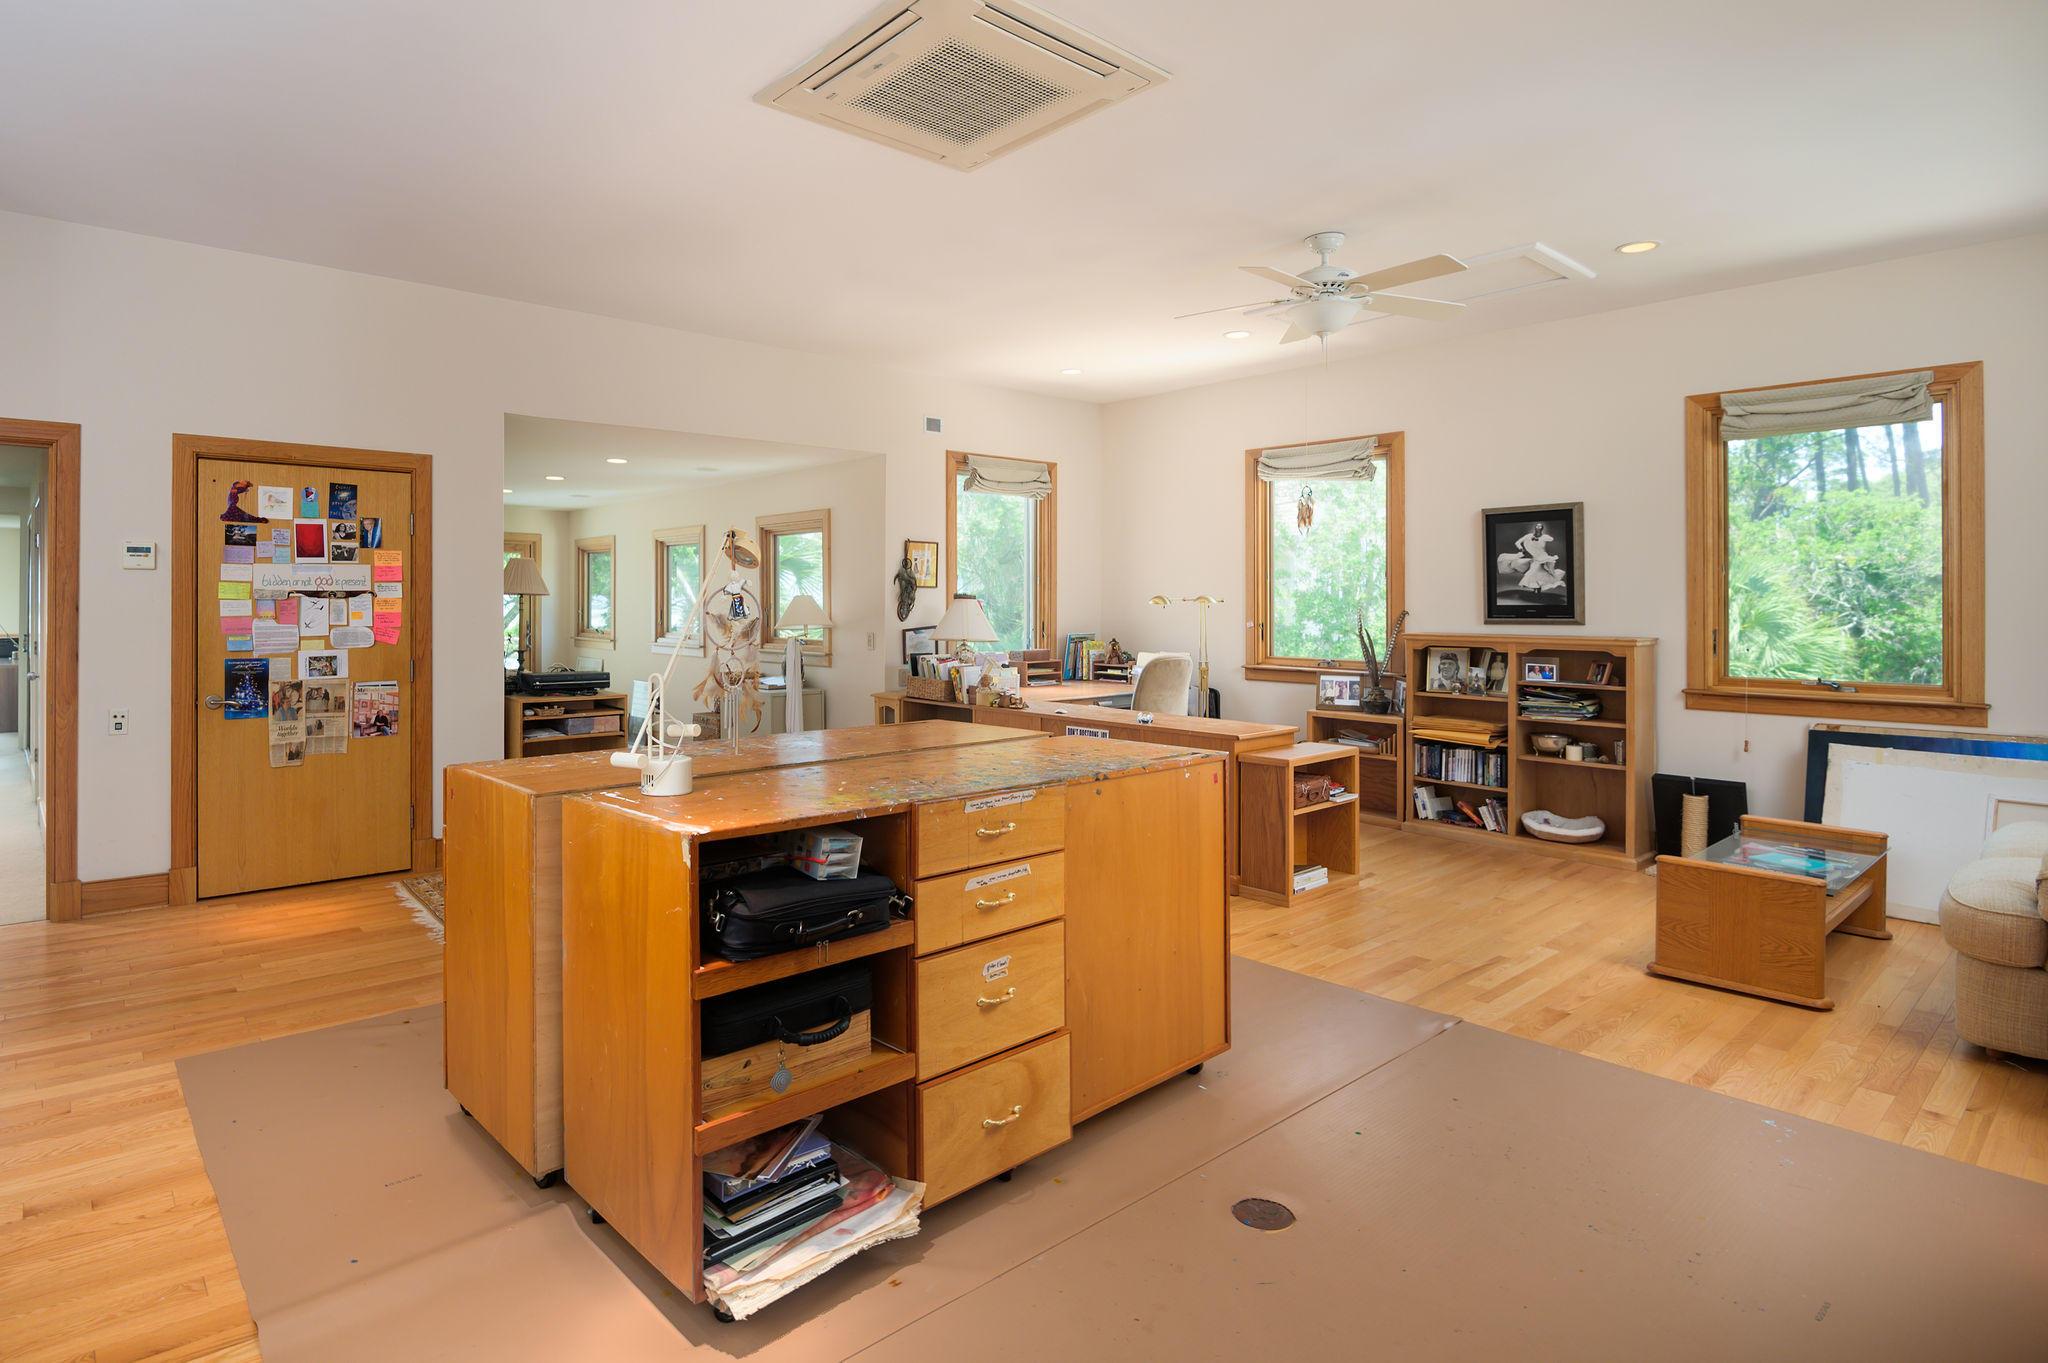 Seabrook Island Homes For Sale - 3087 Marshgate, Seabrook Island, SC - 5